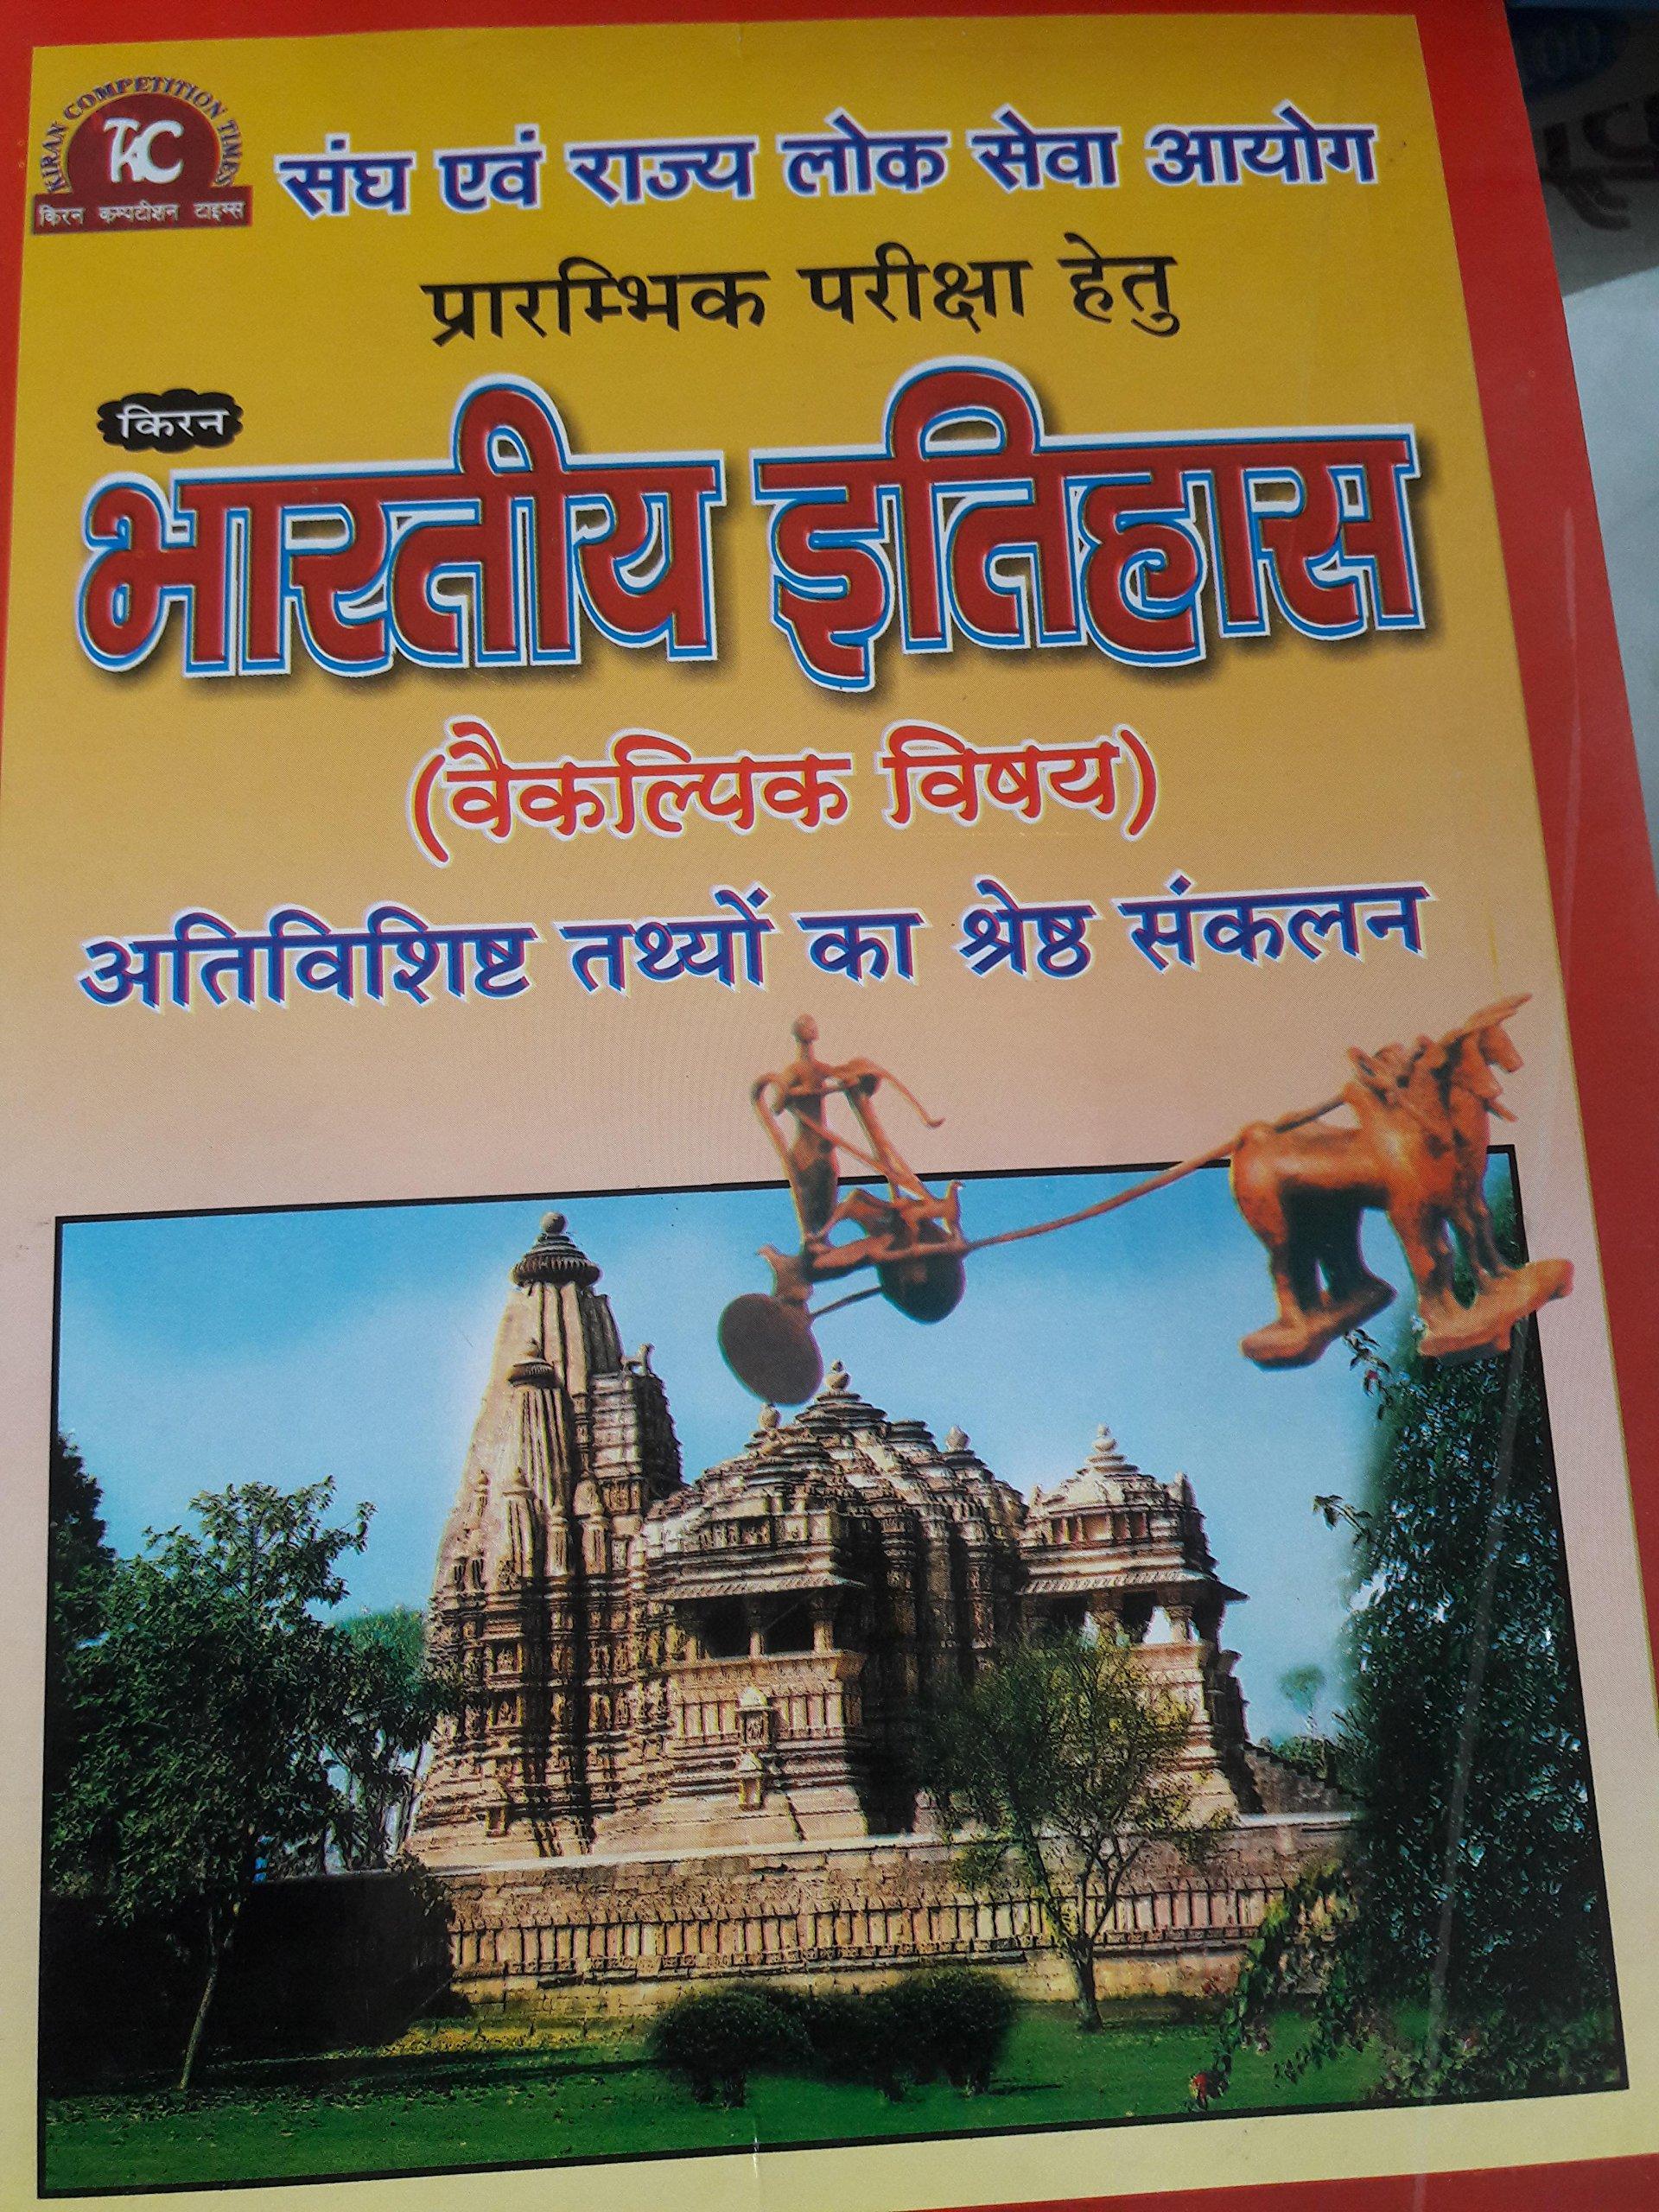 Ncert History Book In Hindi